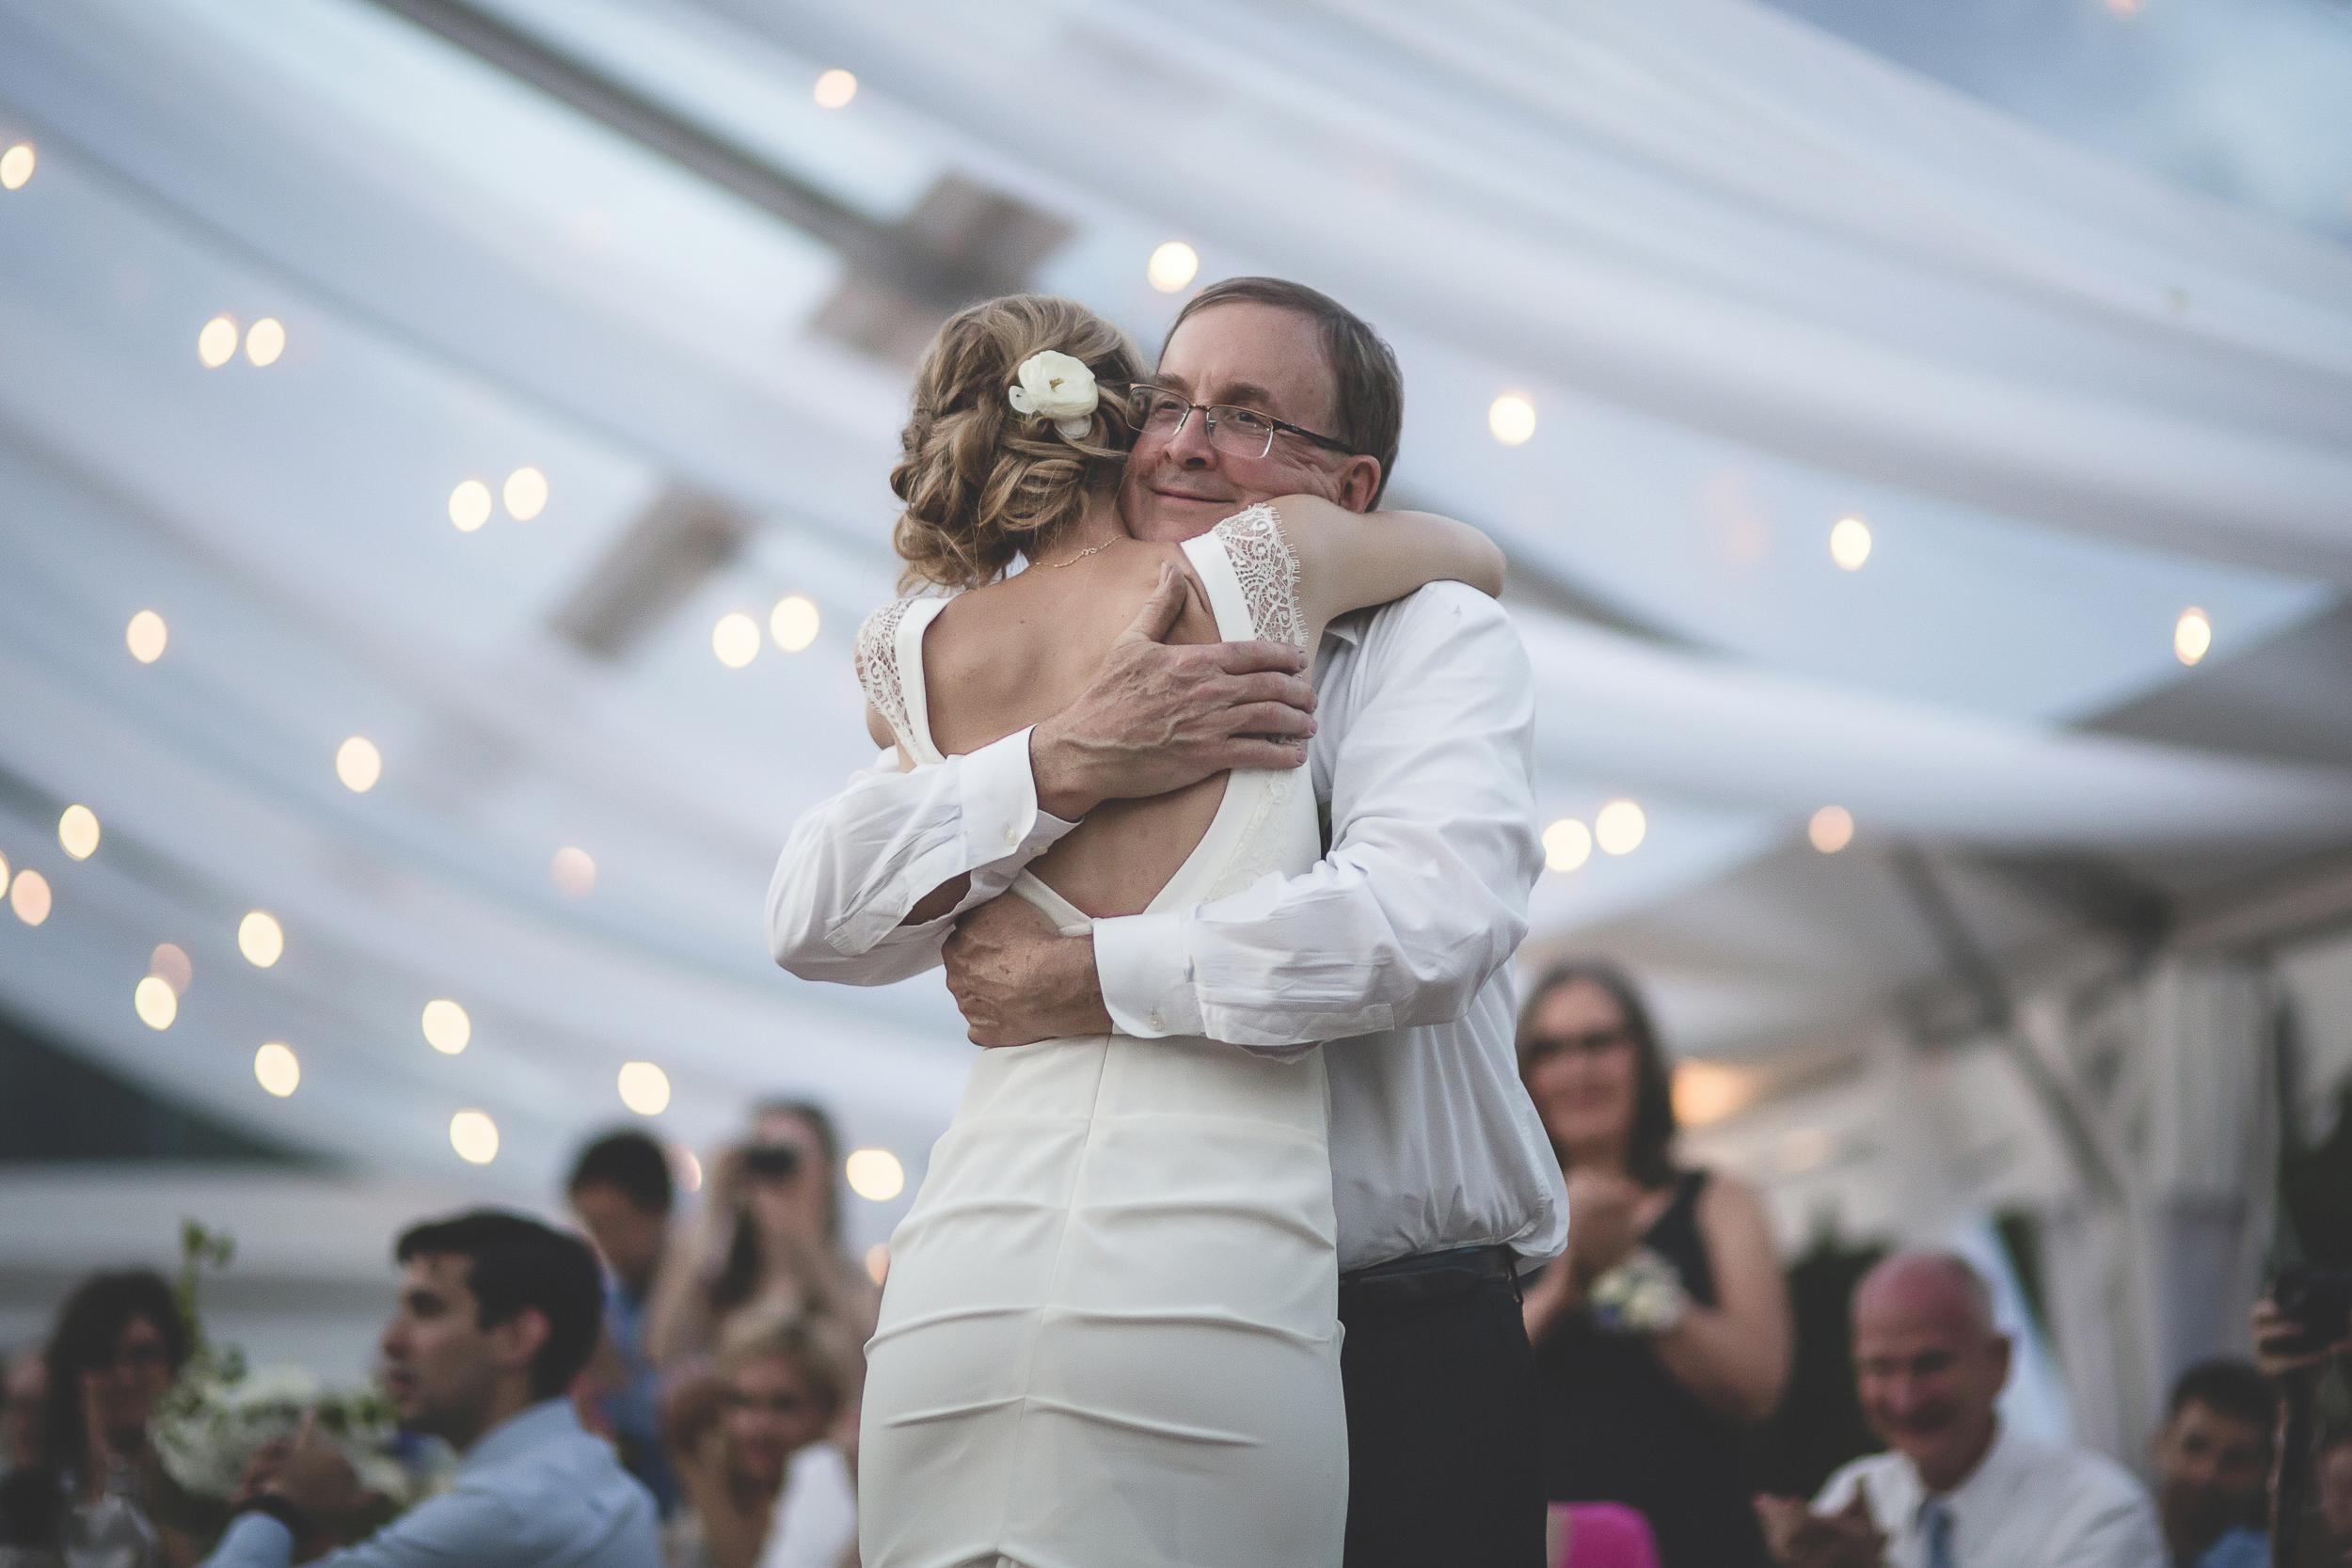 91 Minneapolis home backyard outdoor wedding tent reception dance 1.jpg